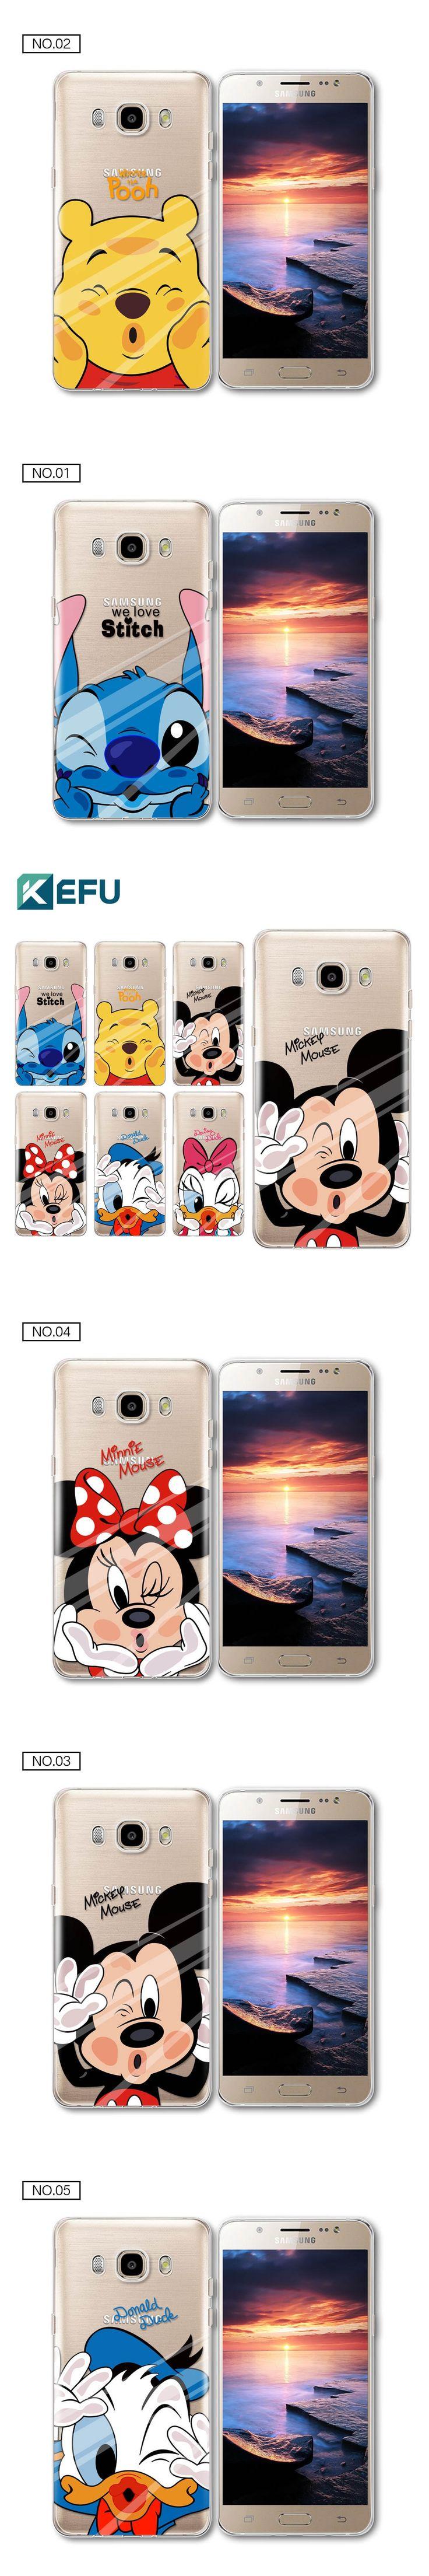 For fundas Samsung Galaxy J5 Kiss hard PC cover for coque Samsung Galaxy A5 2016 for Samsung Galaxy S7 Edge J1 J5 J7 A3 A5 S7